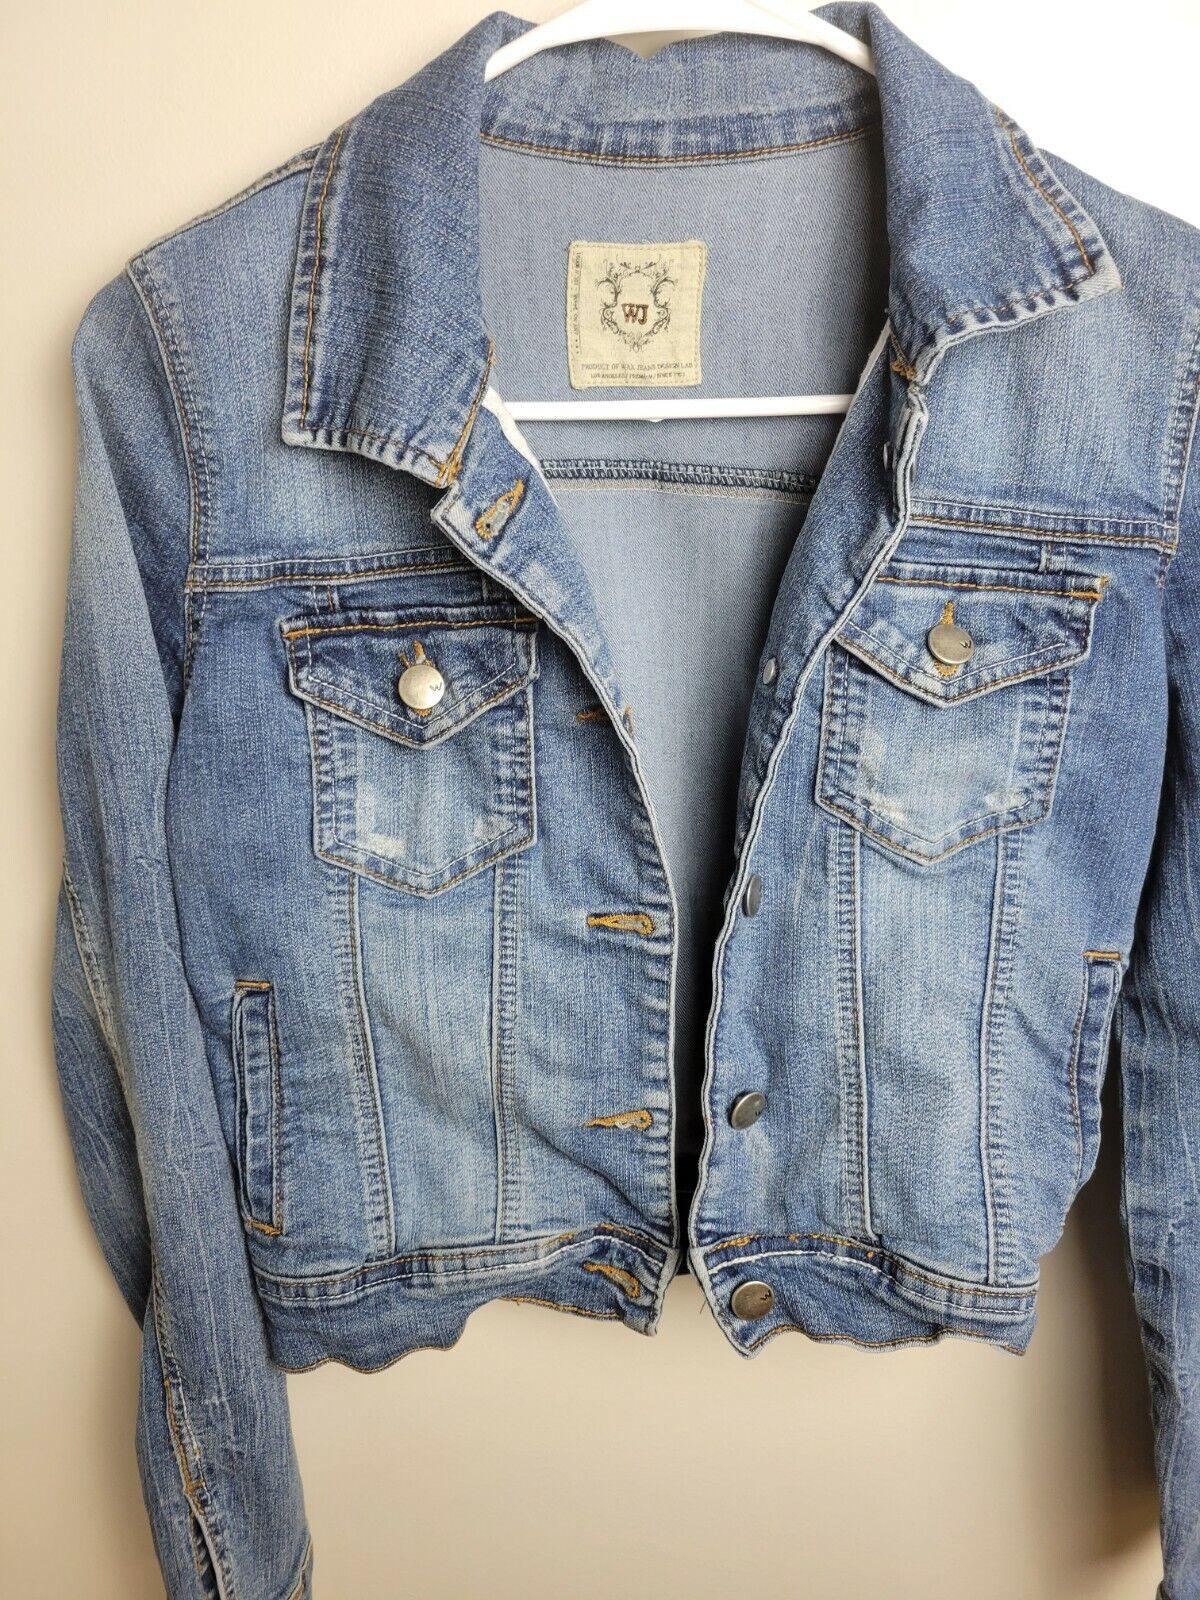 Womens Jean Jacket Small Wax Jeans - image 6